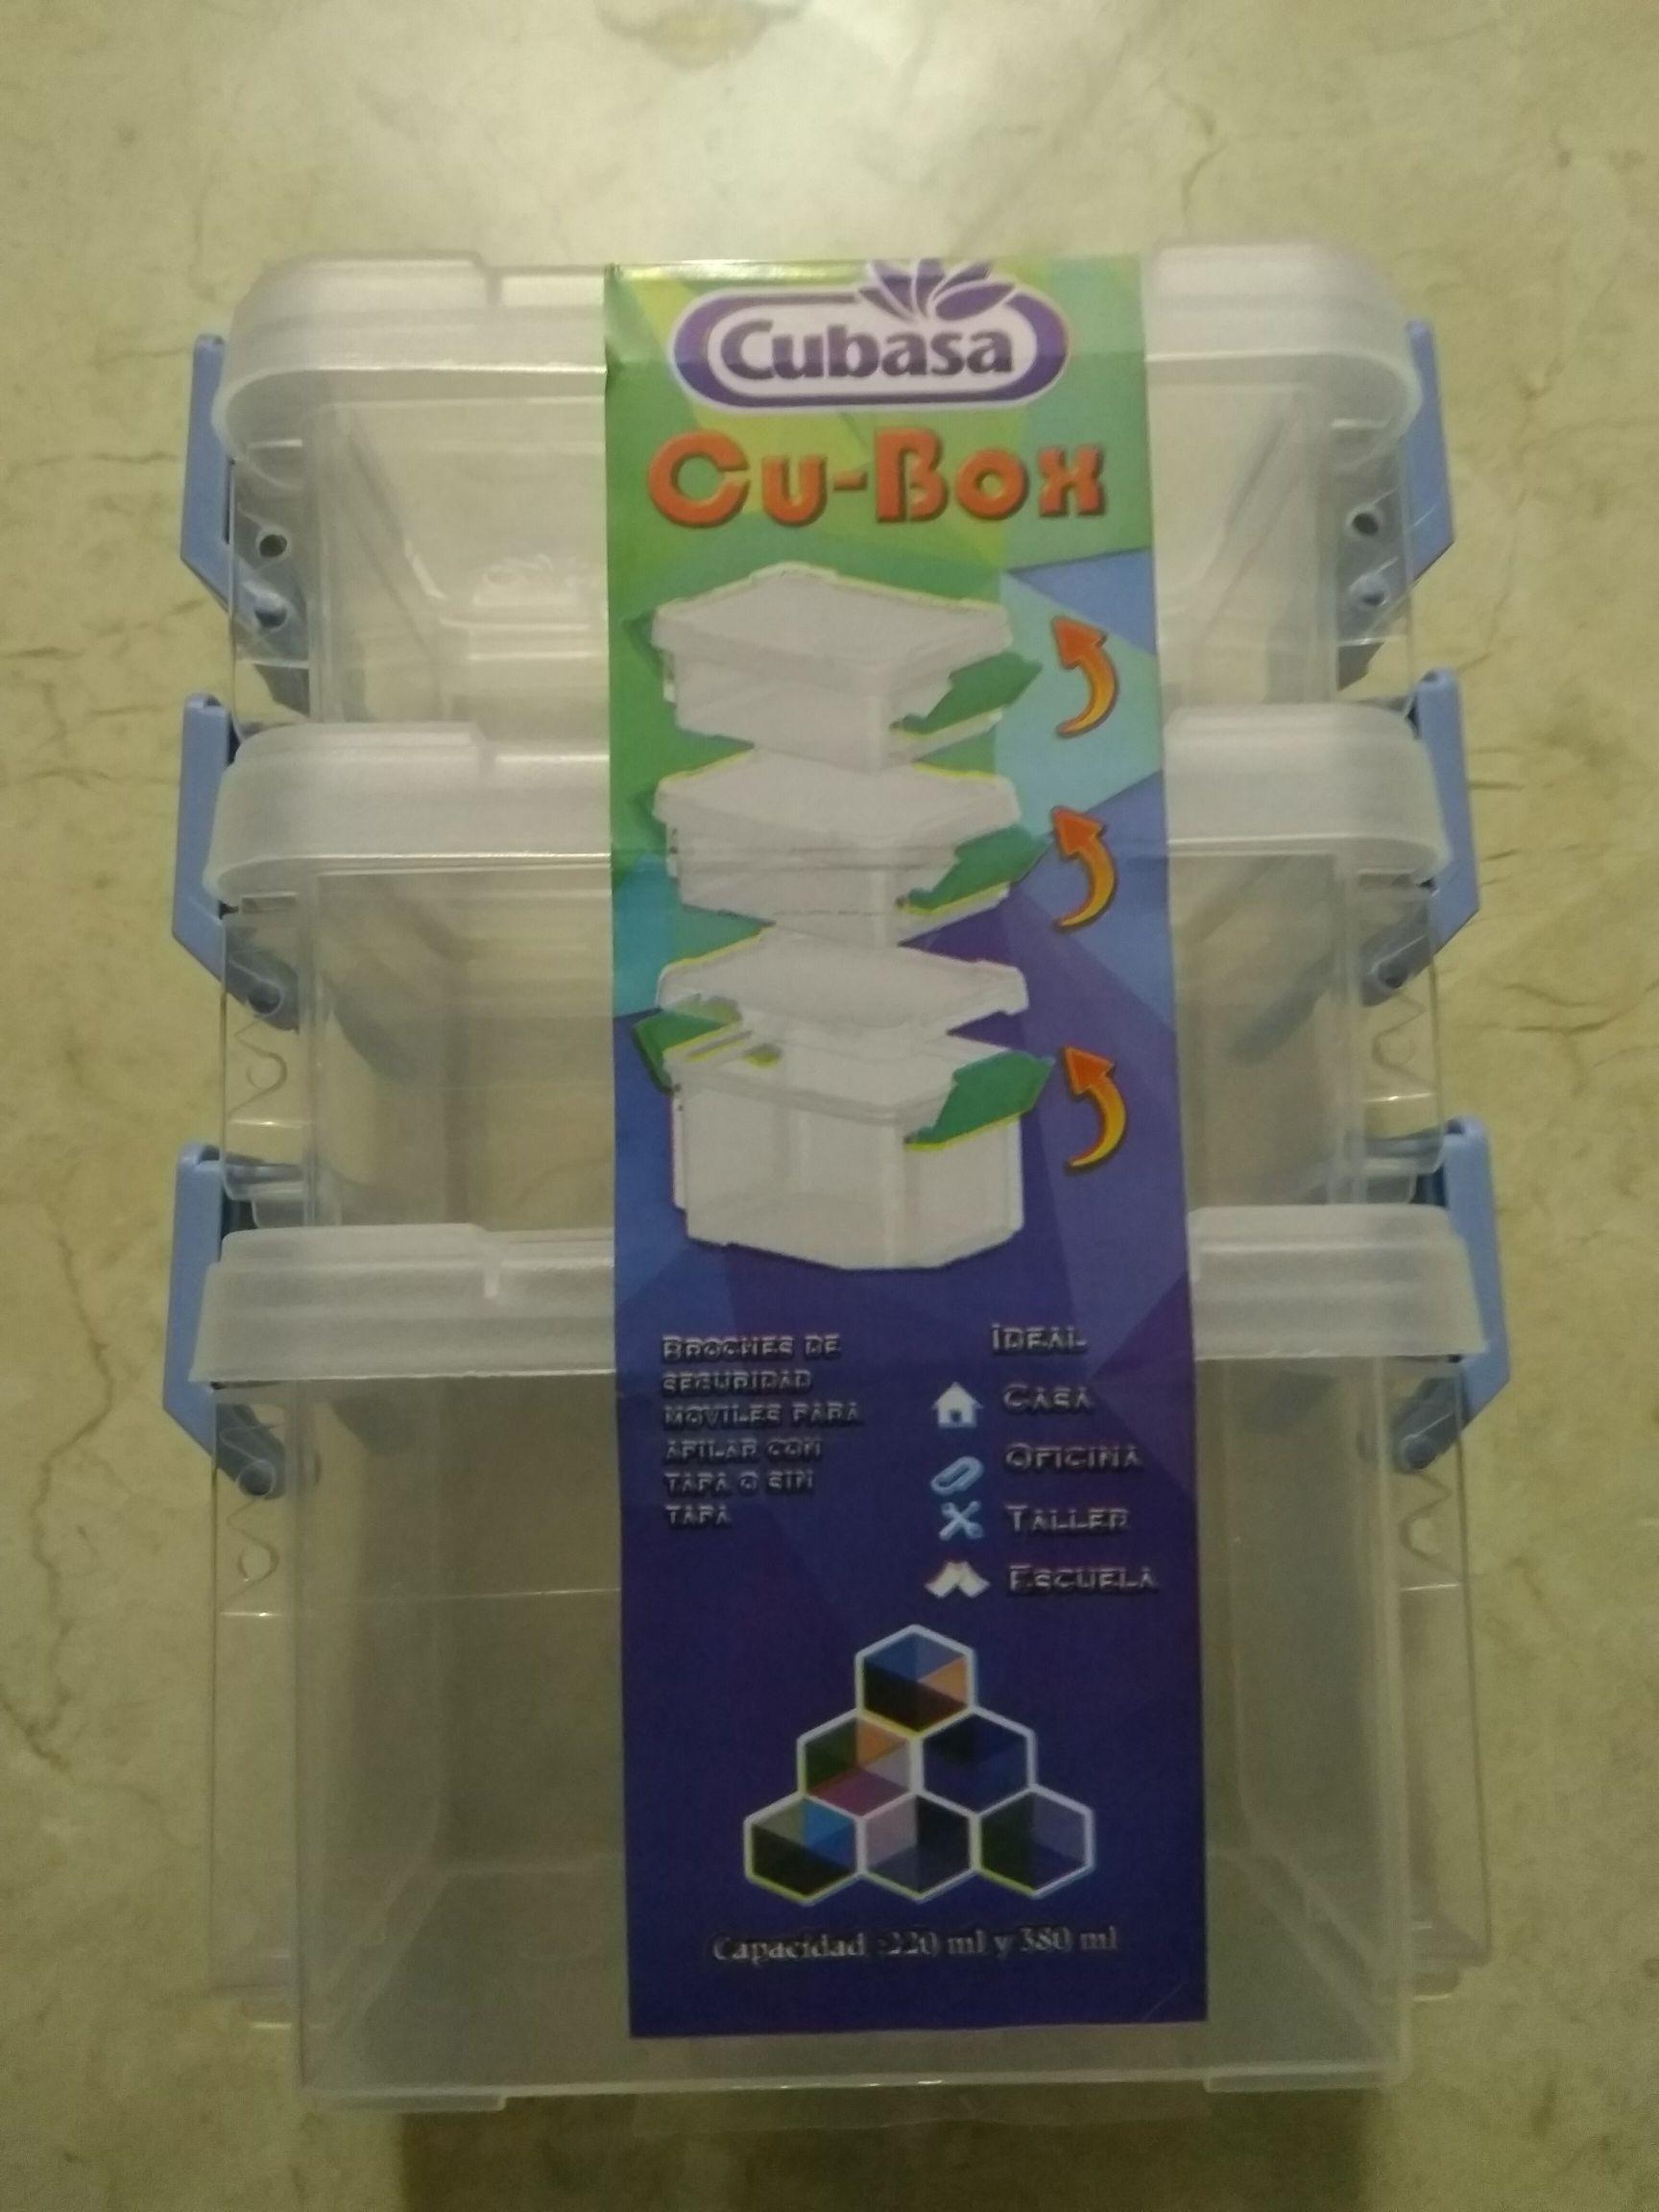 Walmart Cu-Box chico marca Cubasa